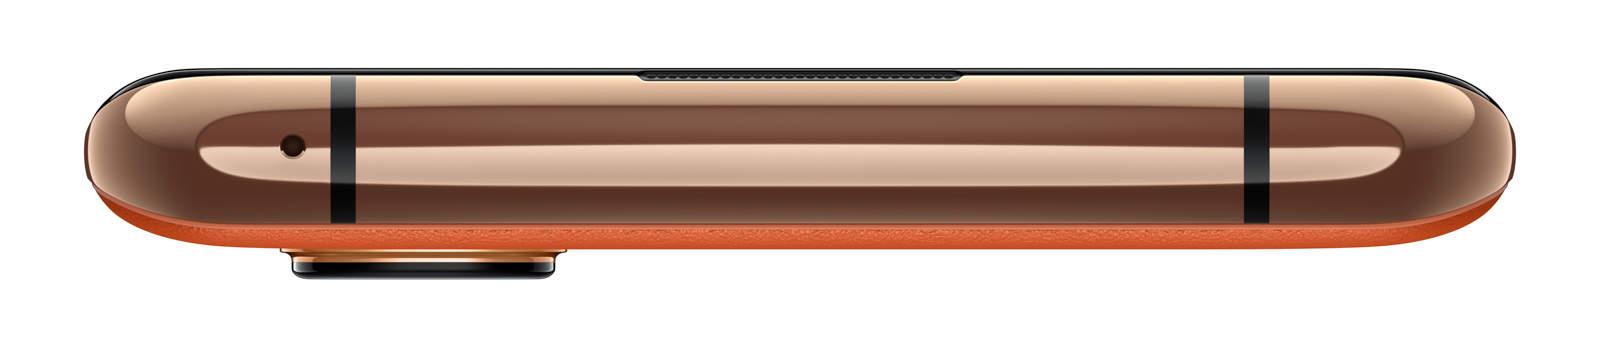 Find X2 Pro Orange Vegan Leather 07